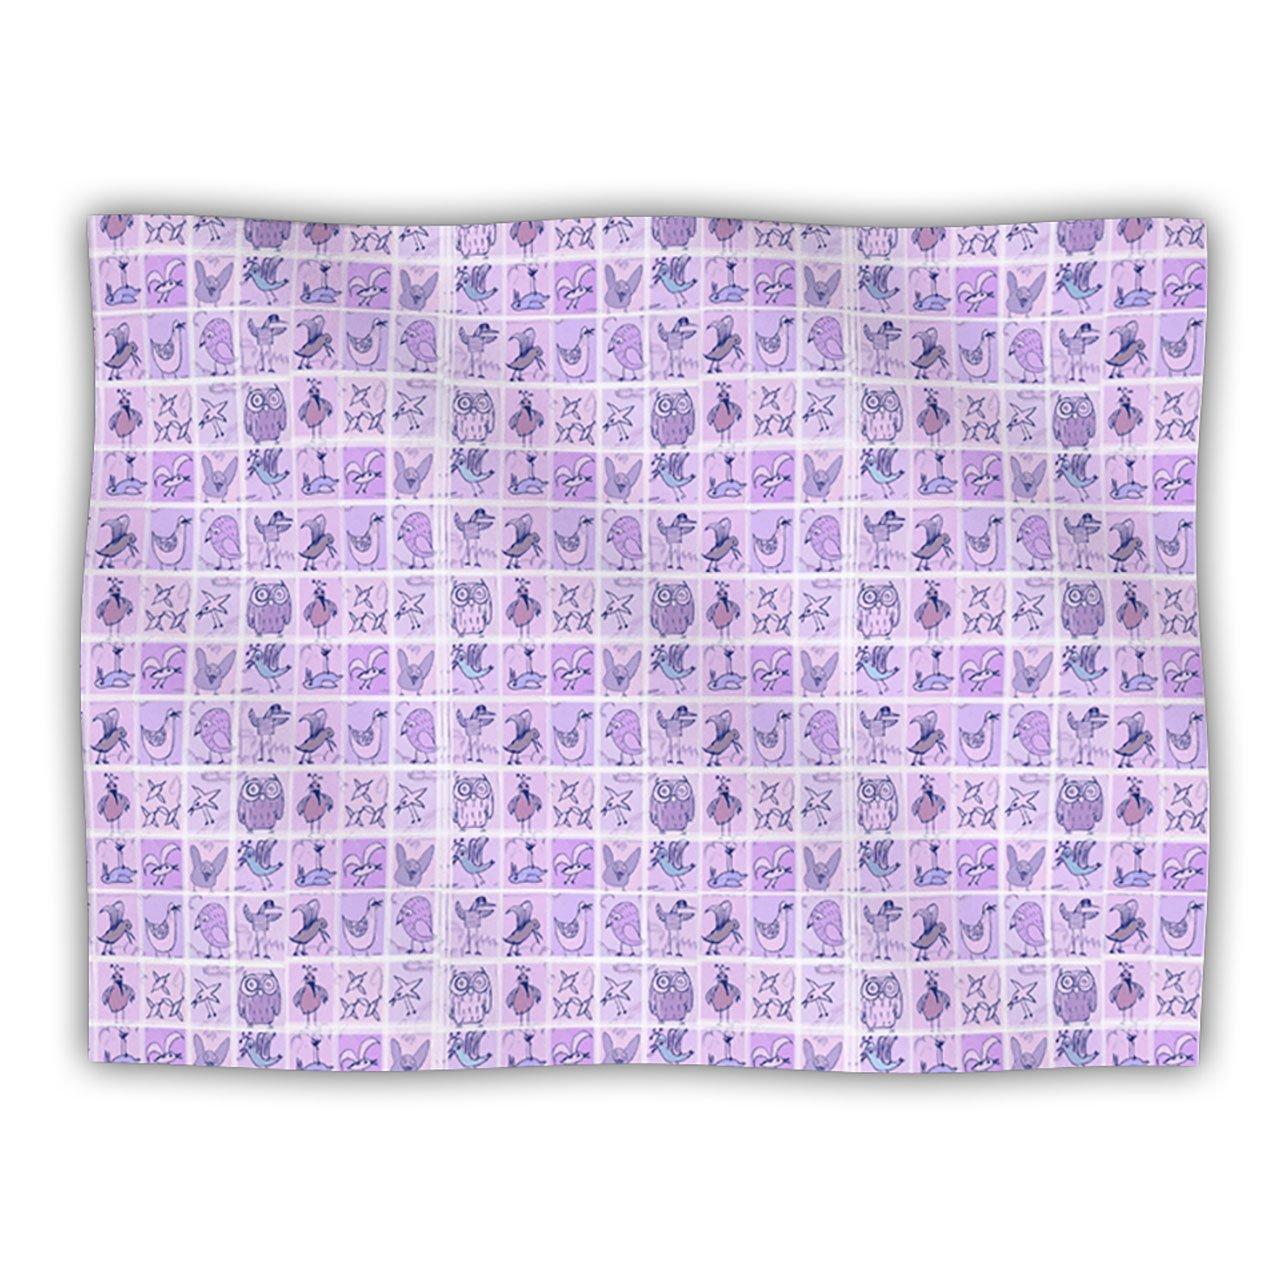 Kess InHouse Marianna Tankelevich ''Cute Birds Purple'' Pet Blanket, 30 by 40-Inch, Pink/Lavender